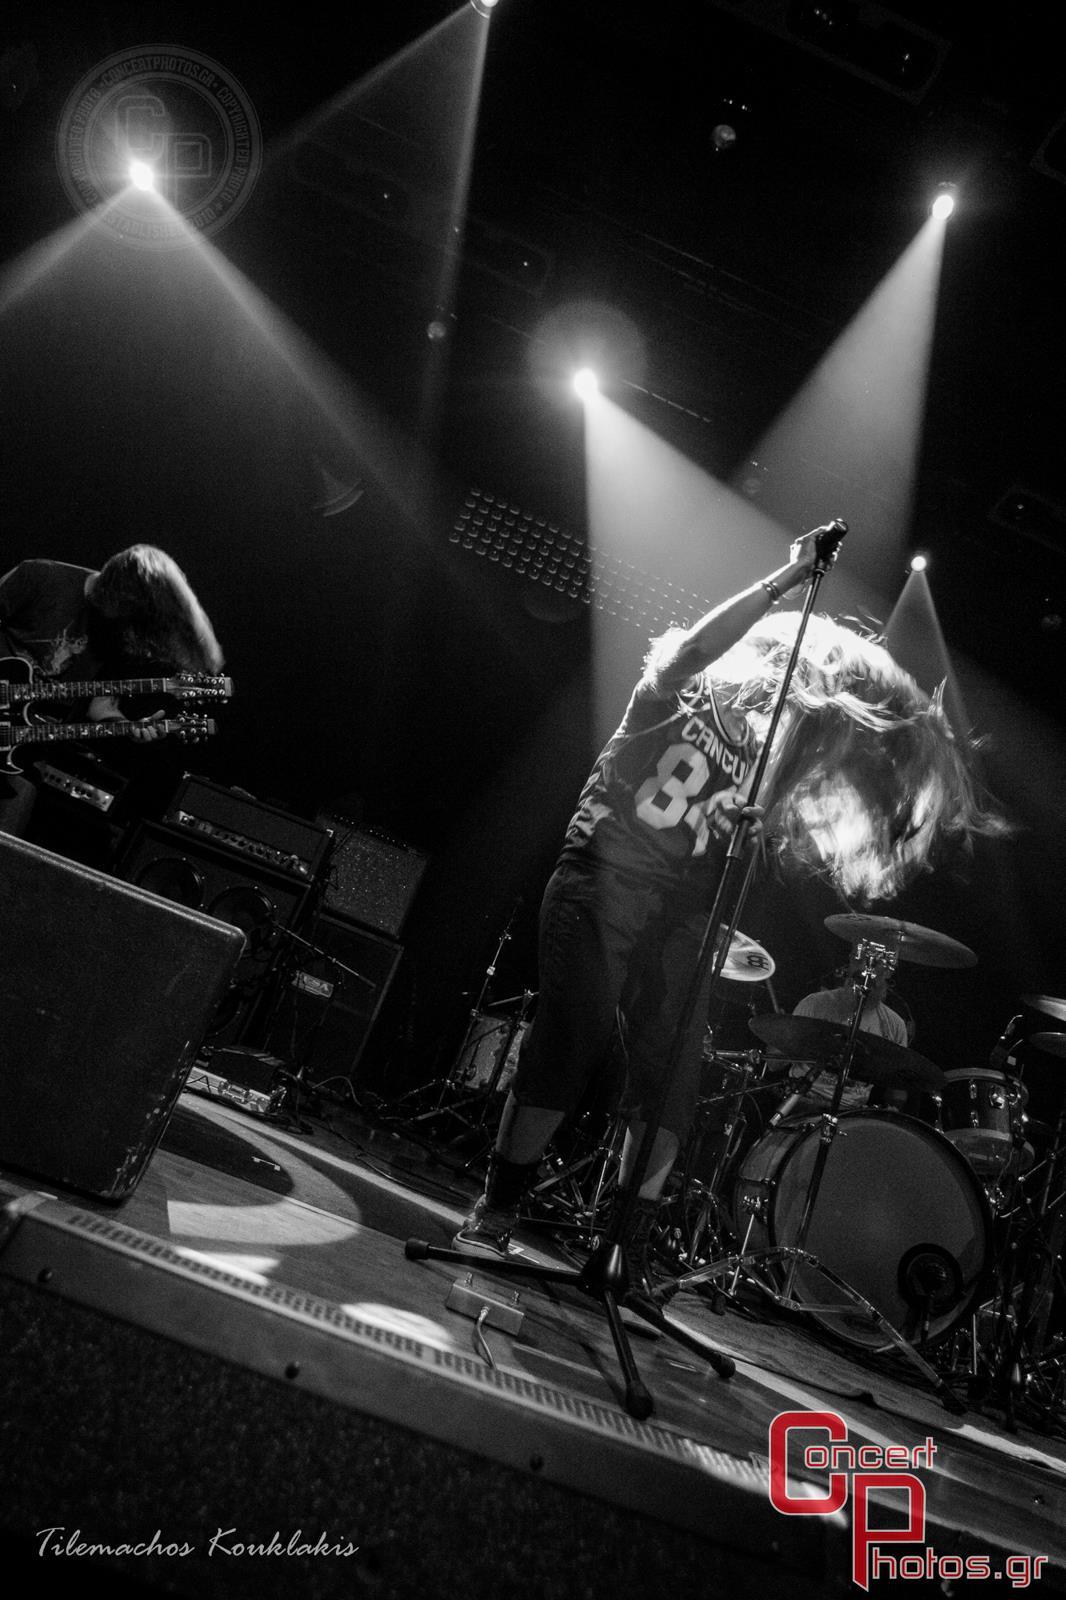 Neurosis-Neurosis photographer:  - concertphotos_20140707_23_56_50-3